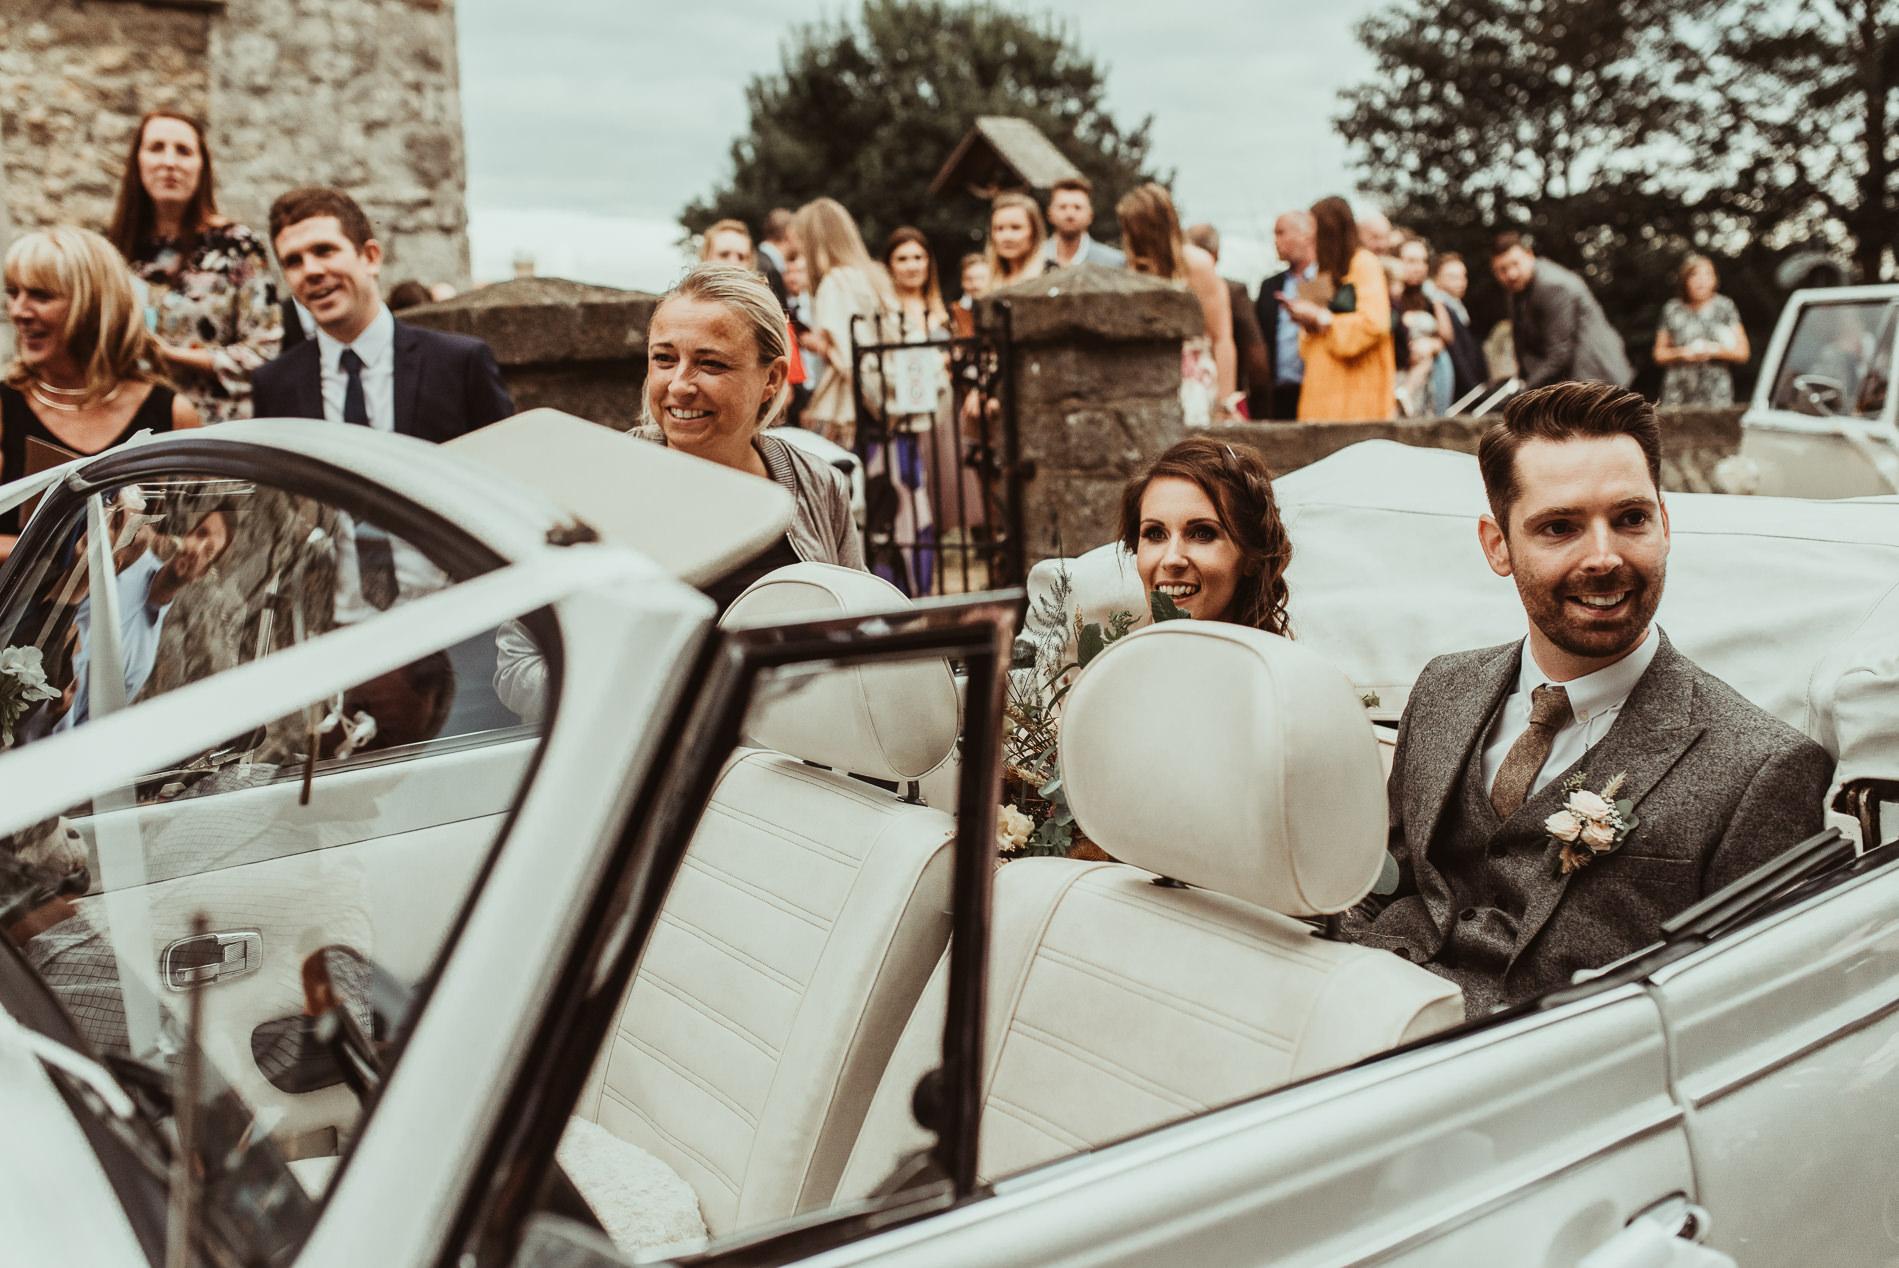 red_brick_barn_weddings_leigh_on-_sea_church-61